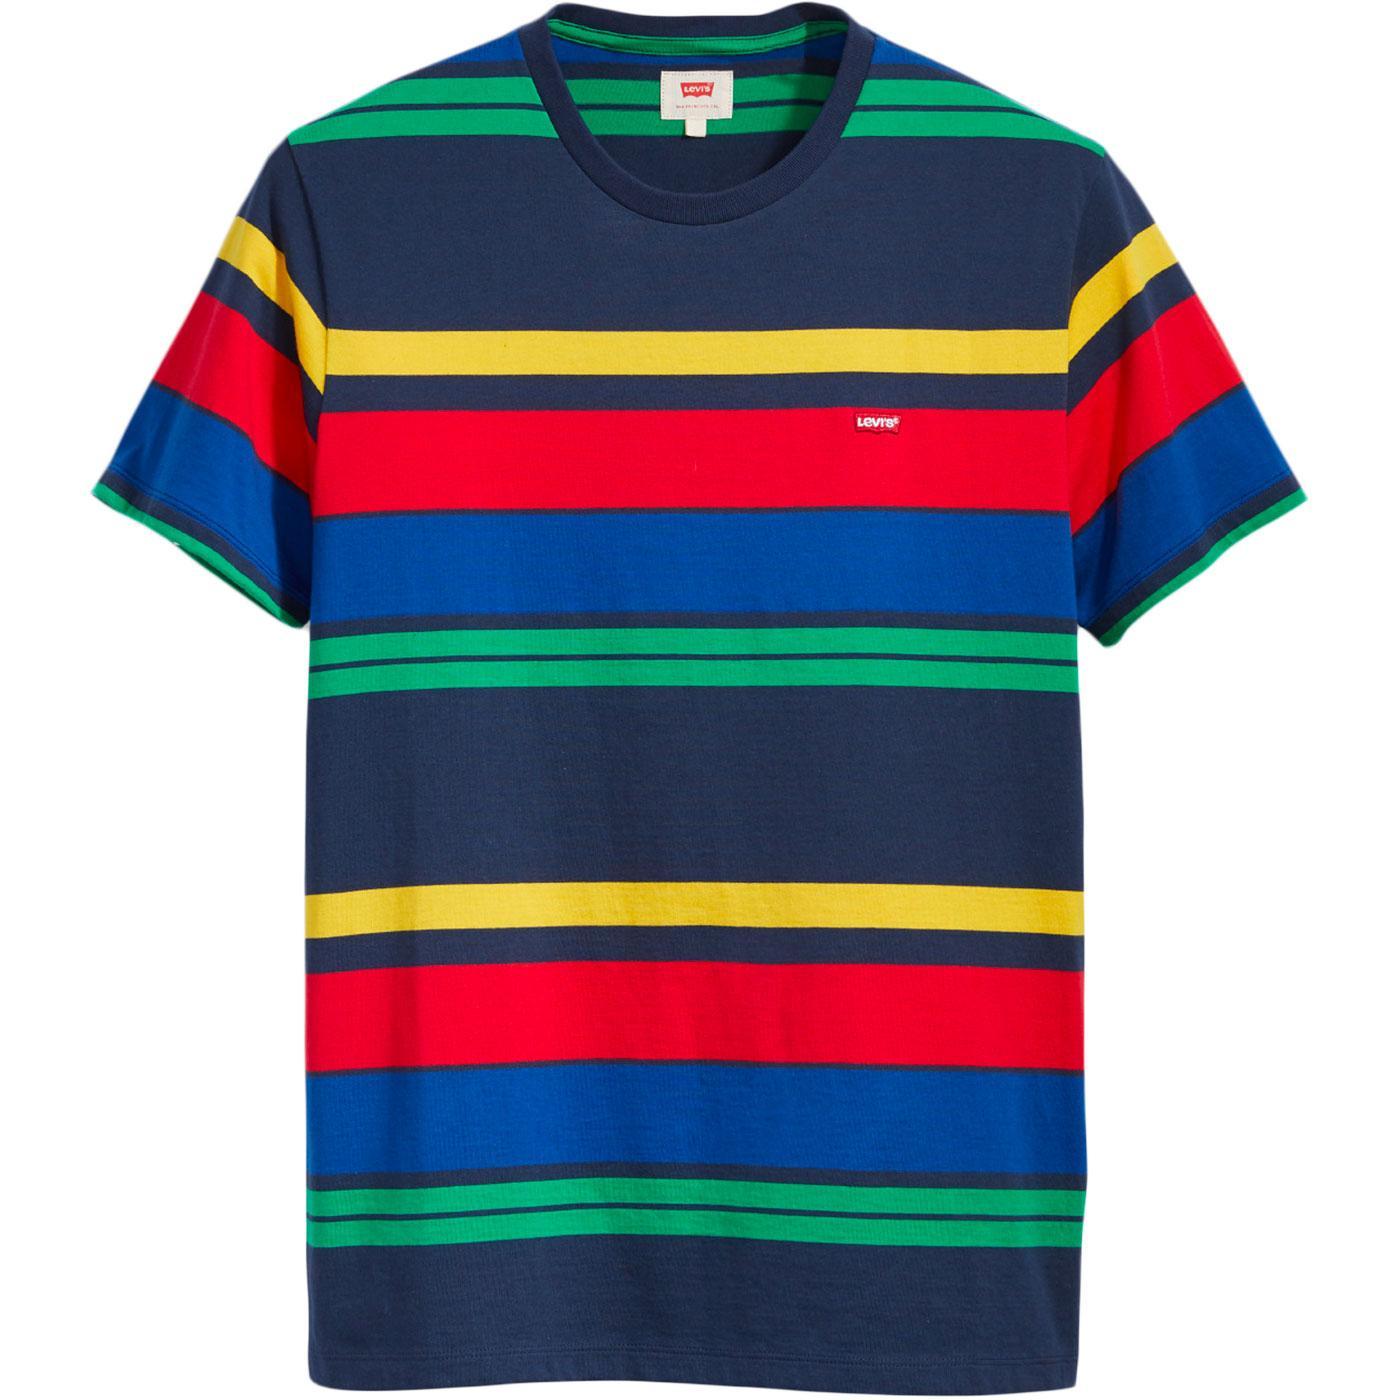 LEVI'S Men's Retro Housemark Multi Stripe T-shirt